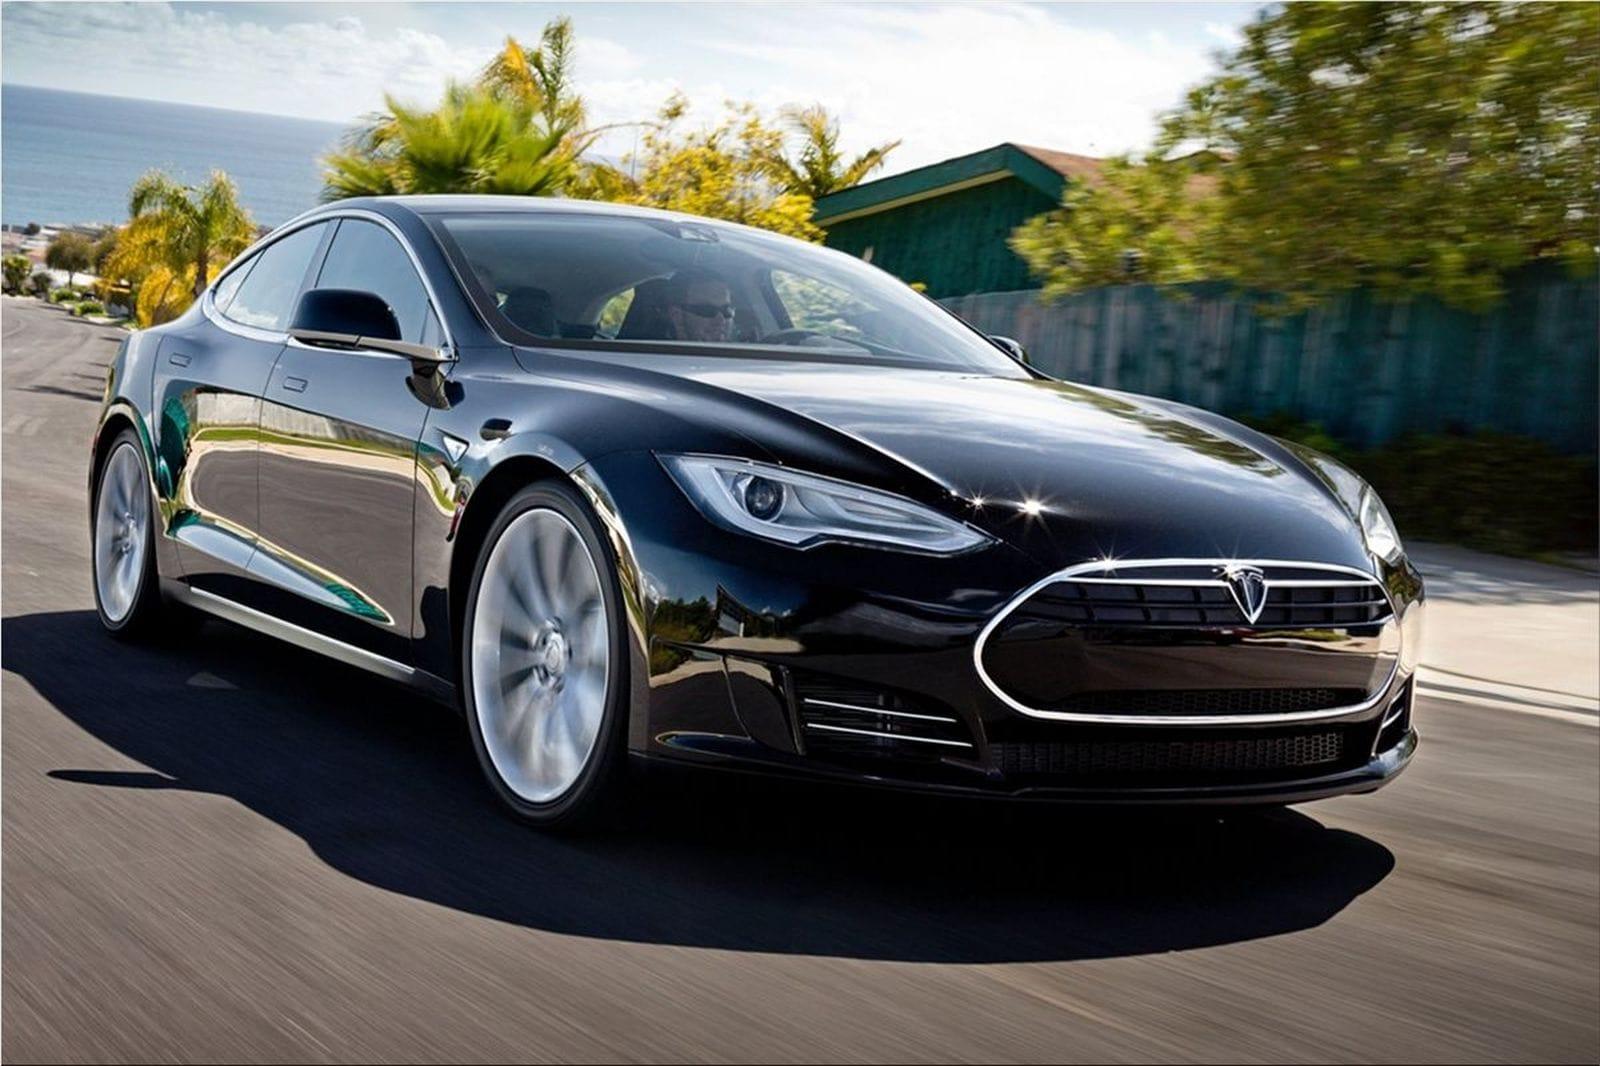 2013 Car of the Year: Tesla Model S Tesla